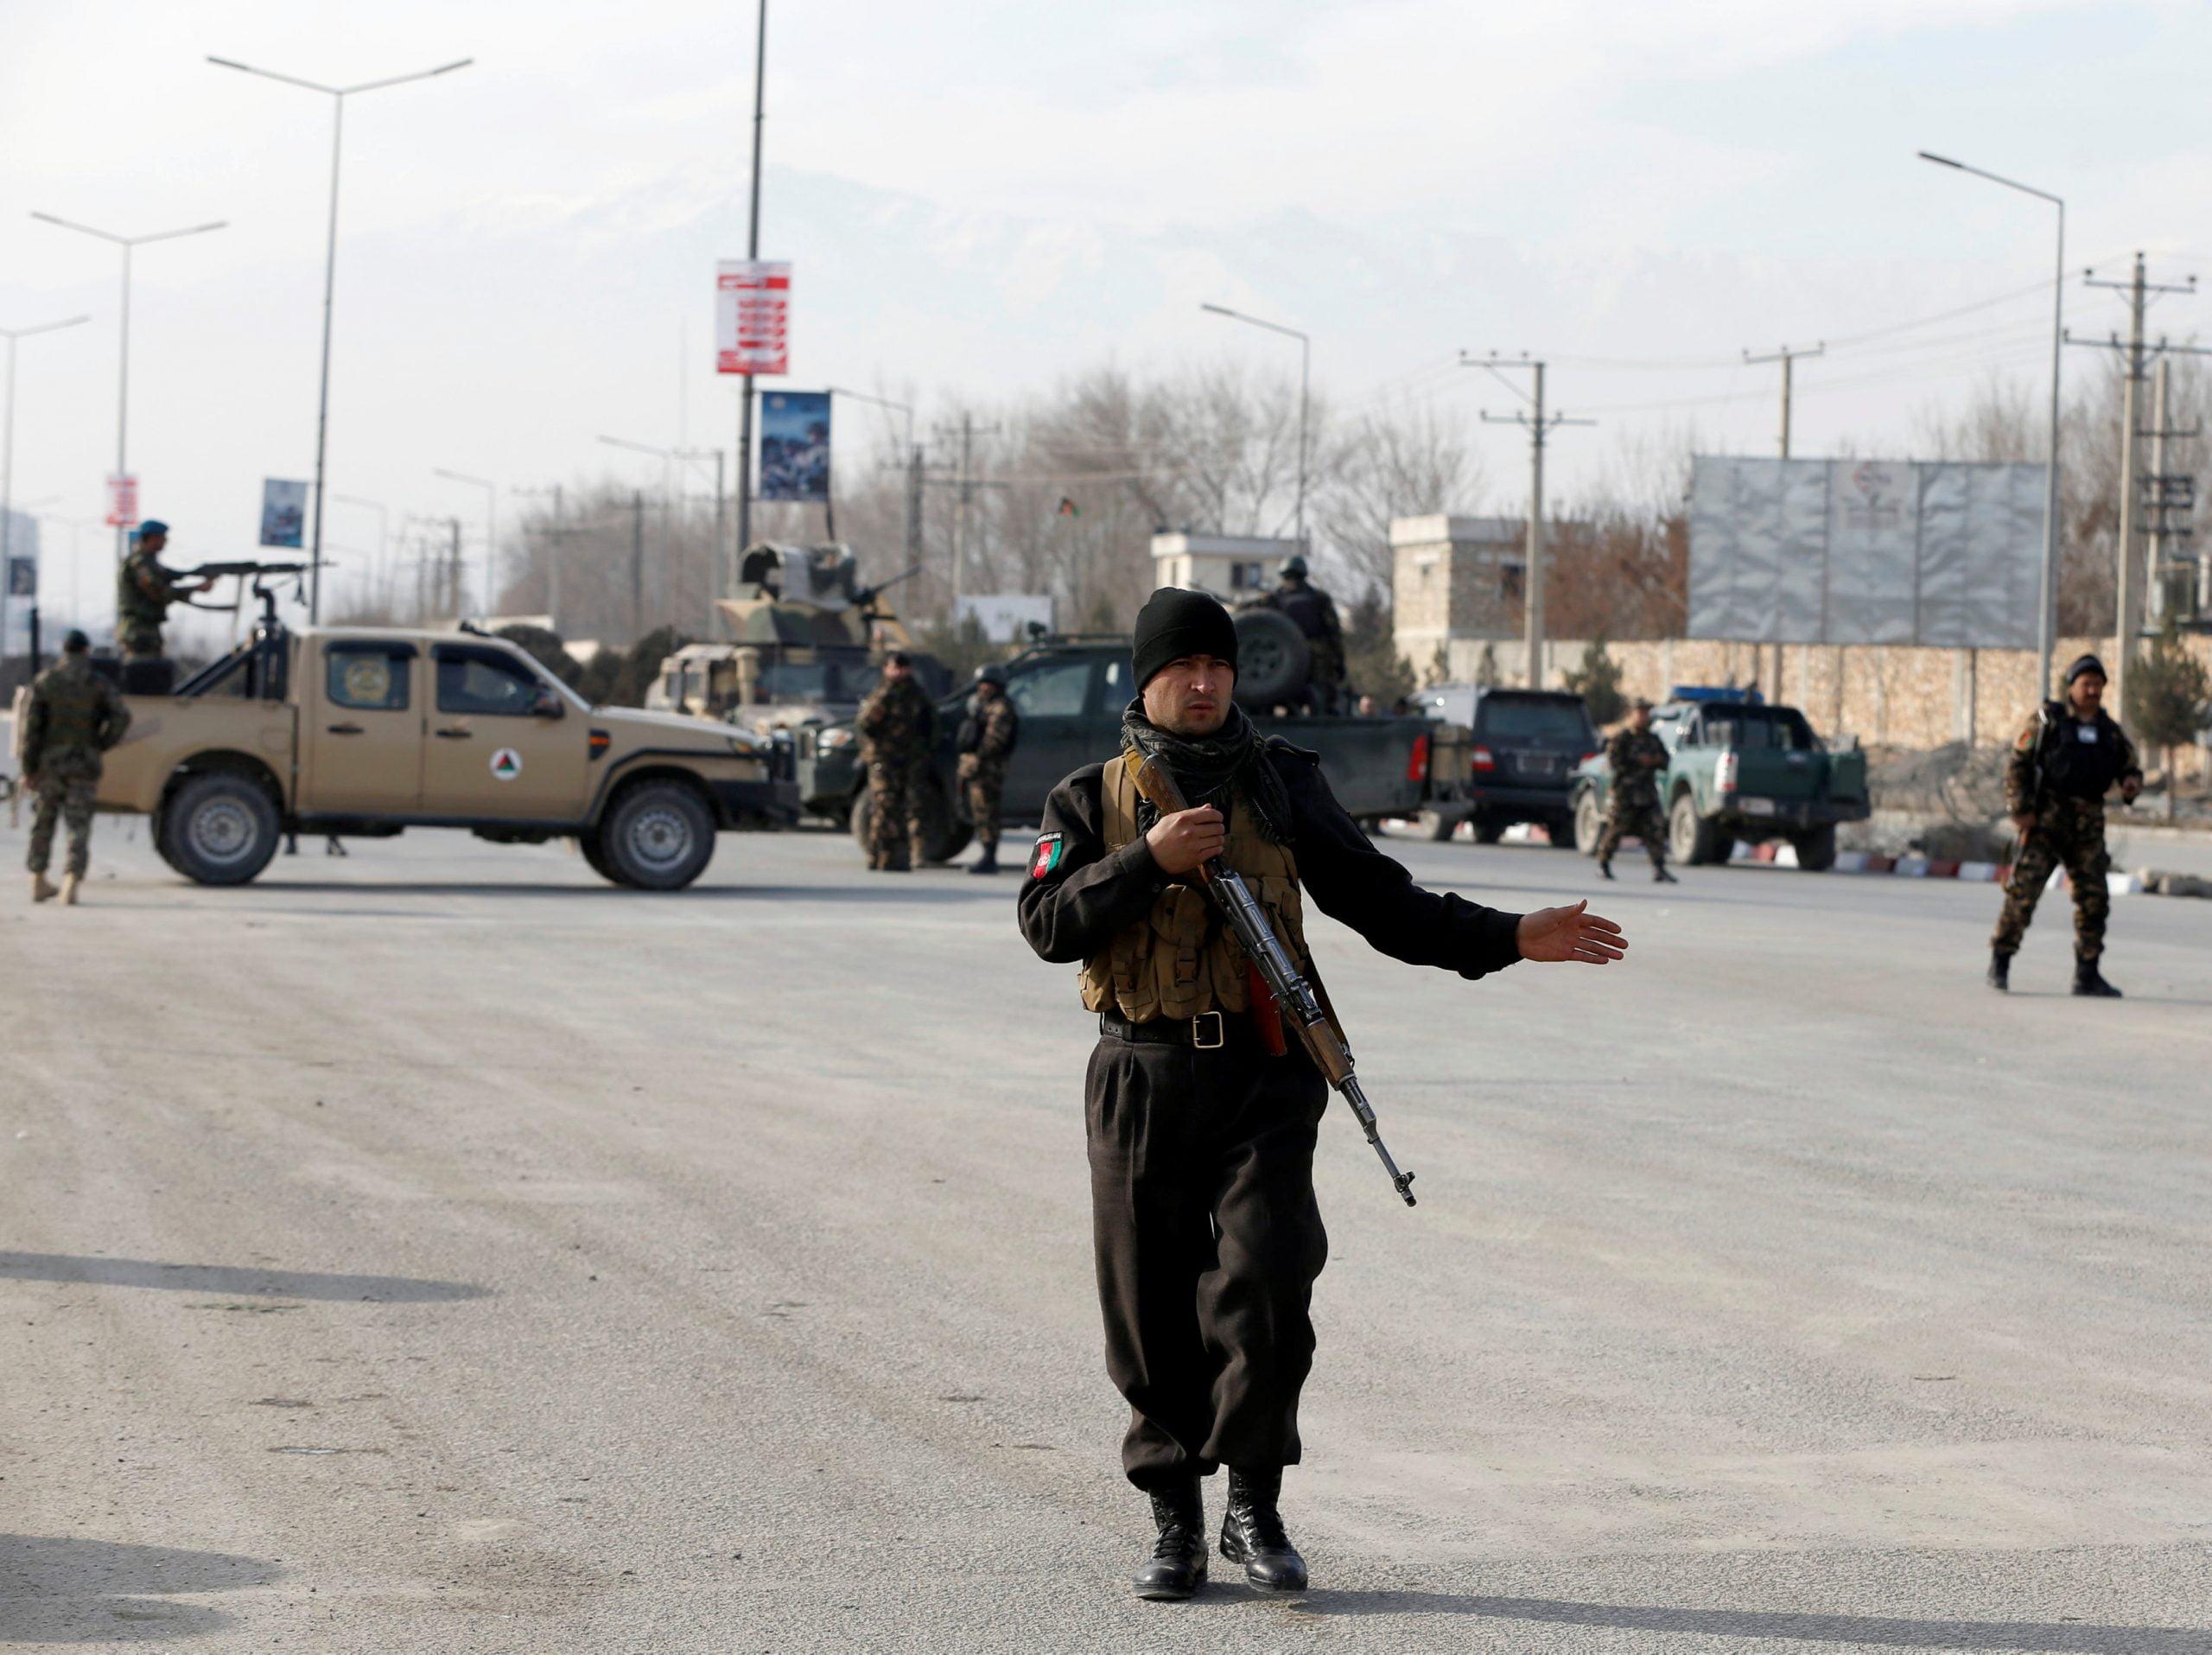 2017 12 18T111901Z 335244741 RC12C84C8D30 RTRMADP 3 AFGHANISTAN ATTACK scaled - الهجوم الدموي على مركز للقوات الخاصة في كابول أدى إلى مقتل 3 أشخاص